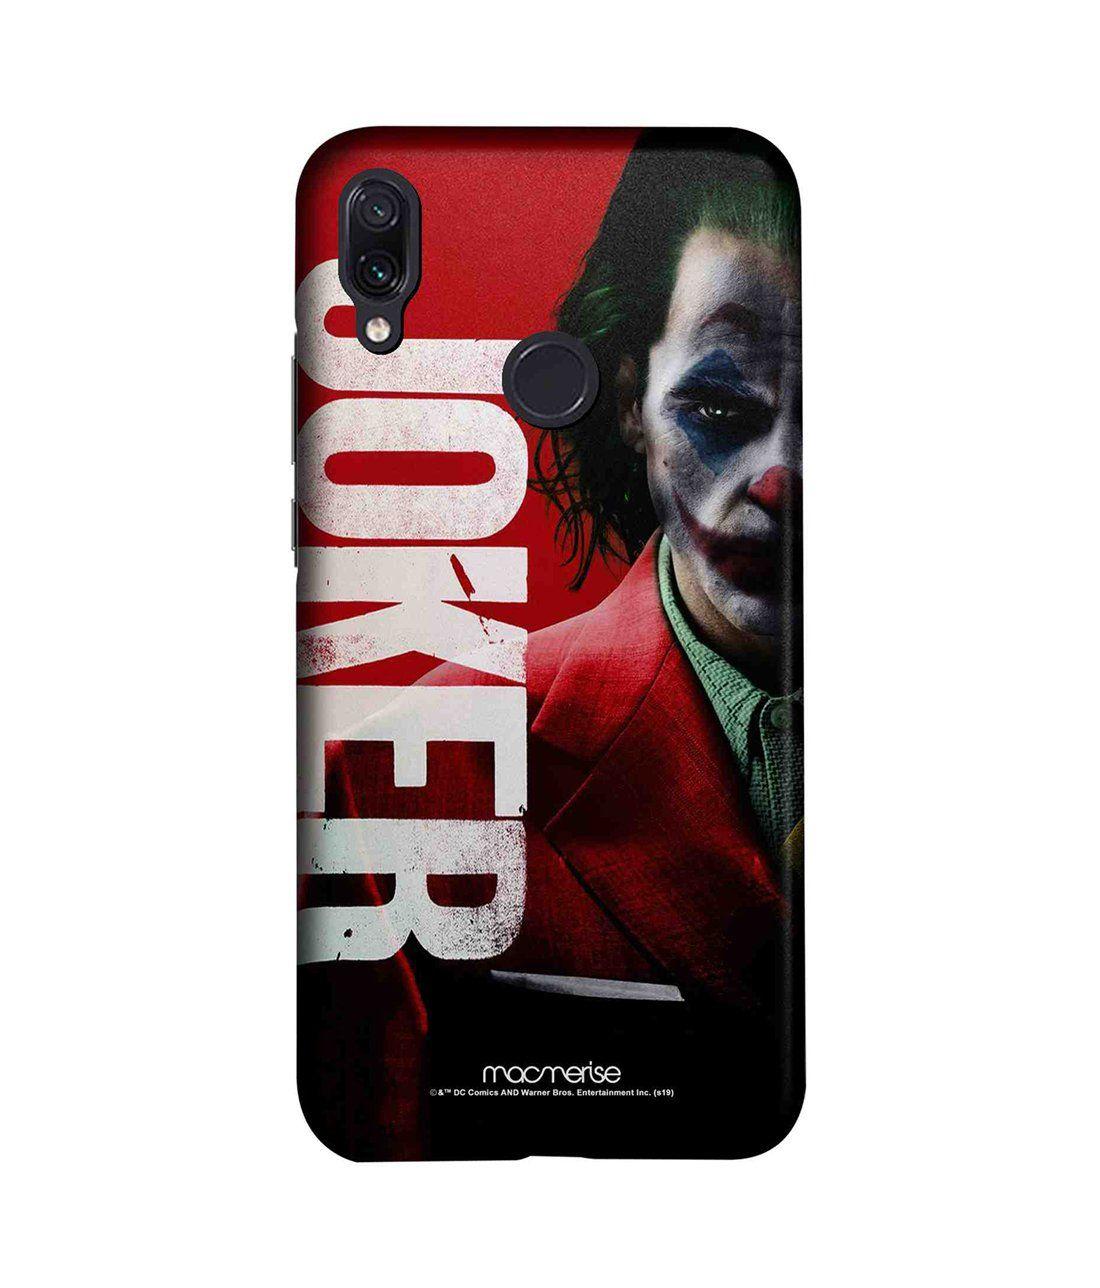 Clown Prince - Sleek Phone Case for Xiaomi Redmi Note 7